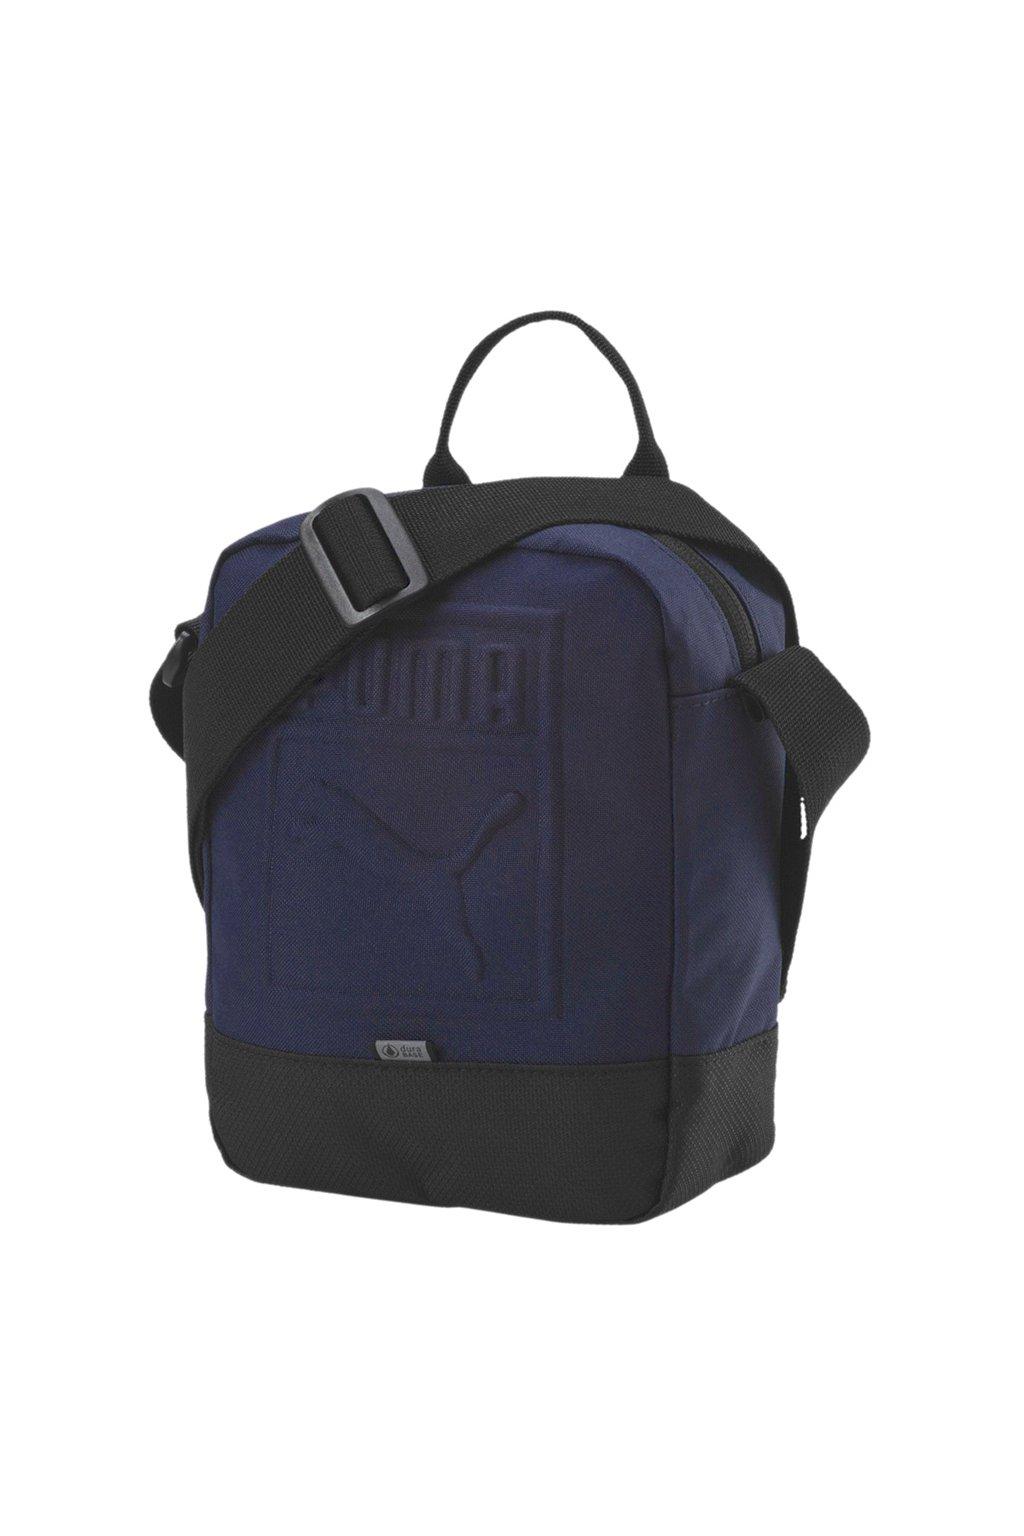 PUMA taška cez rameno 075582-02 - Fresh sport 3a00c316c4a